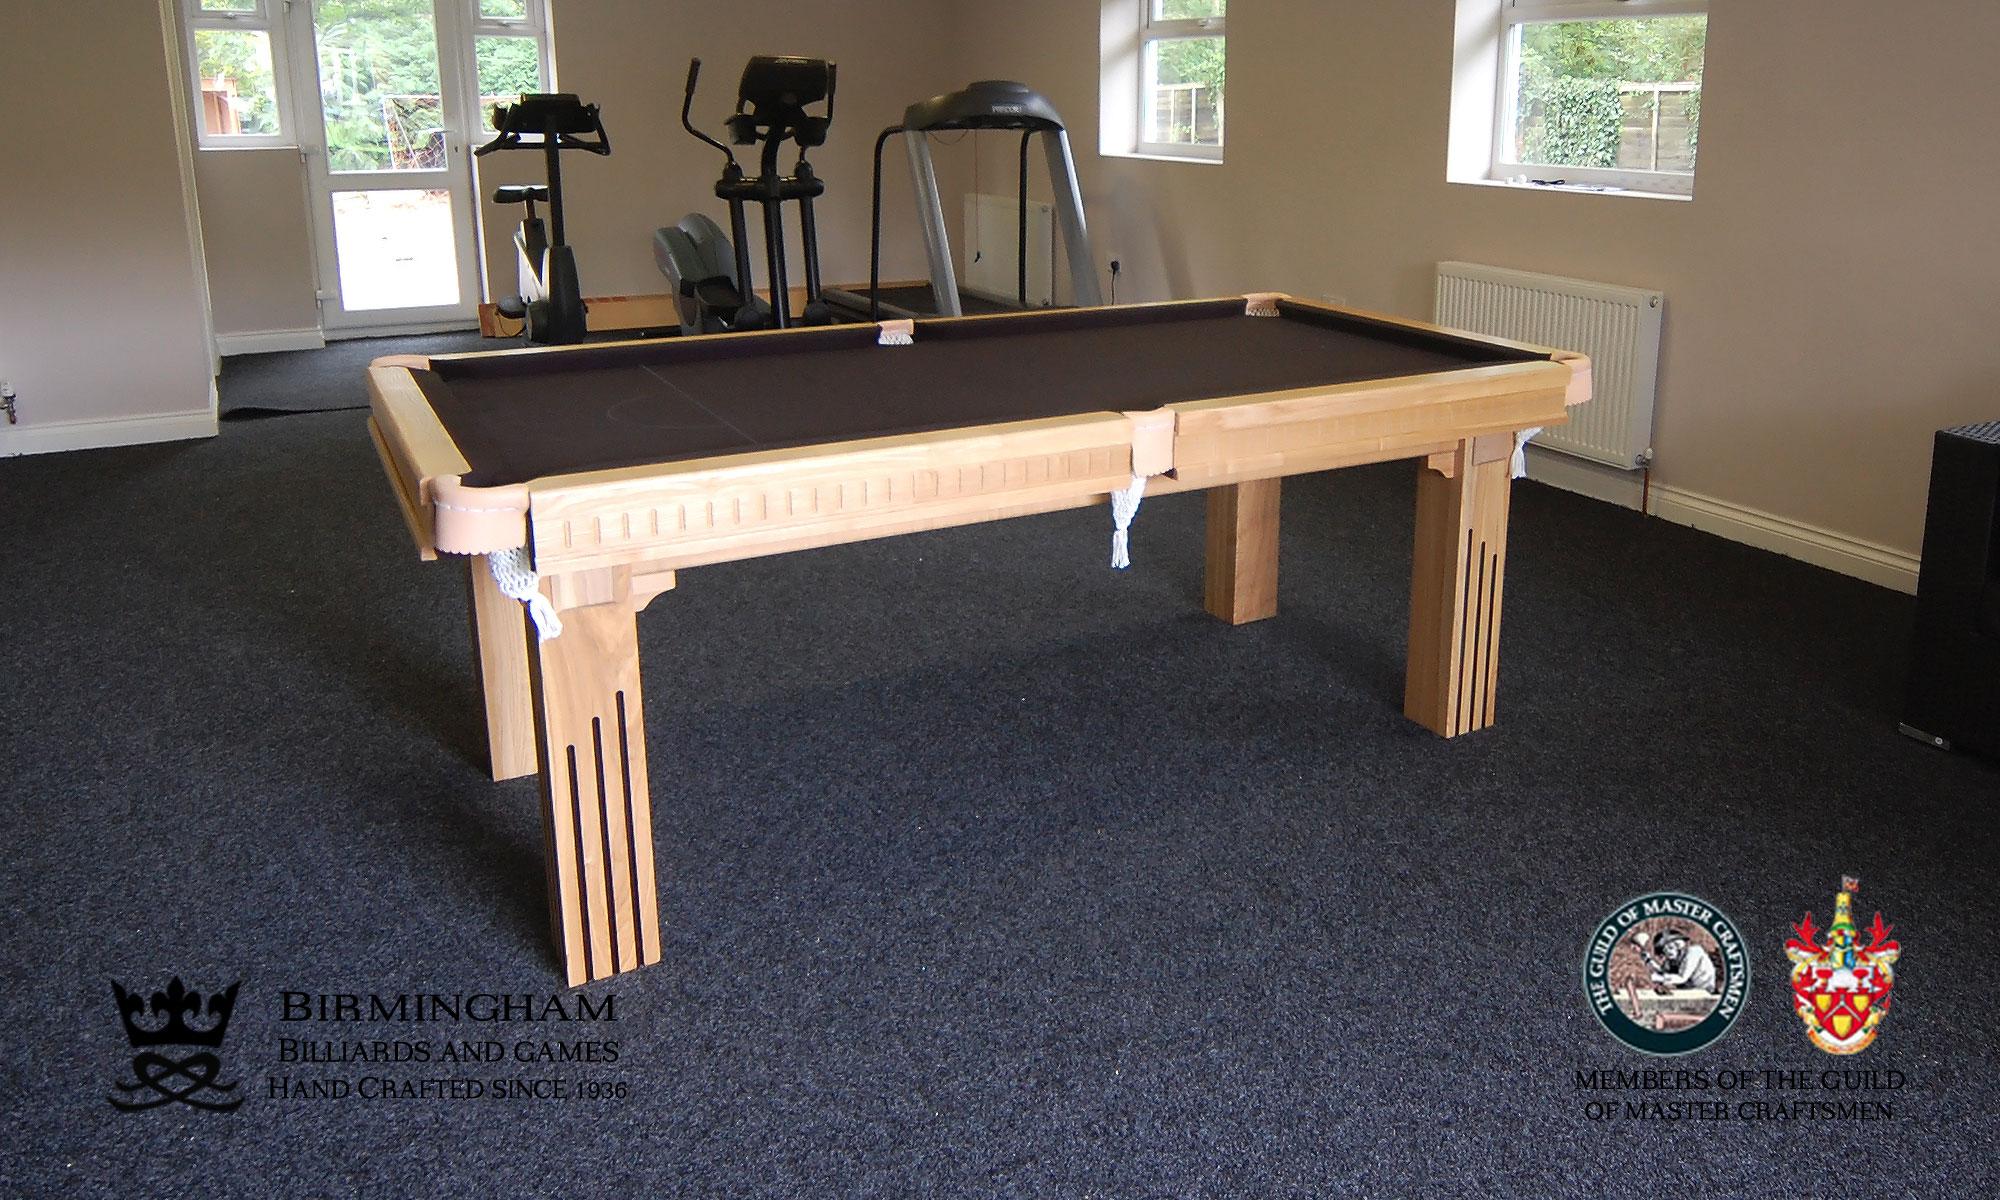 Art deco pool tables